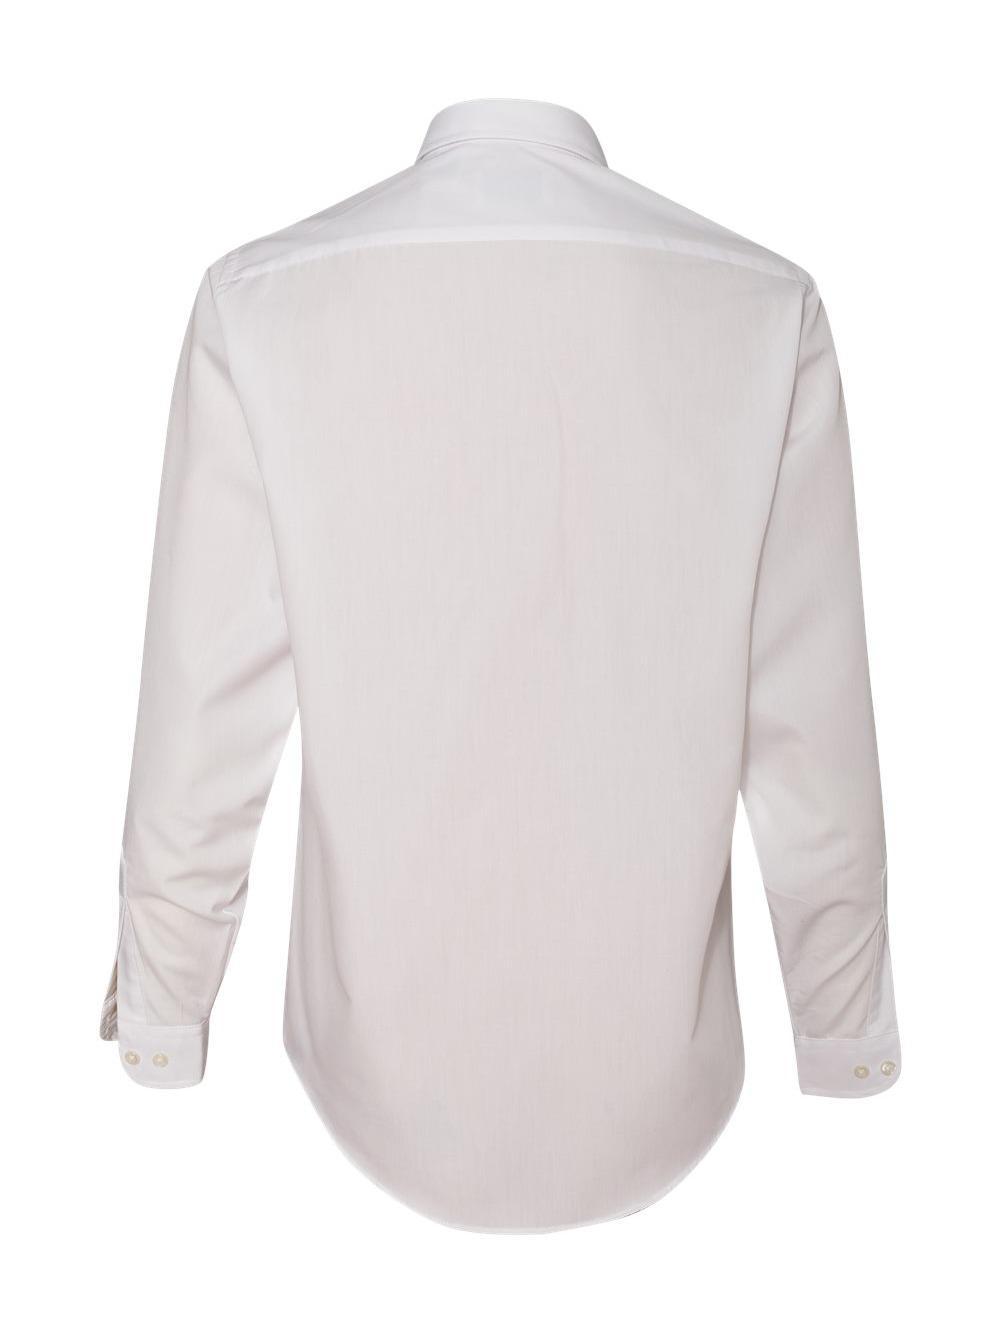 Van-Heusen-Women-039-s-Broadcloth-Long-Sleeve-Shirt-13V0216 thumbnail 7